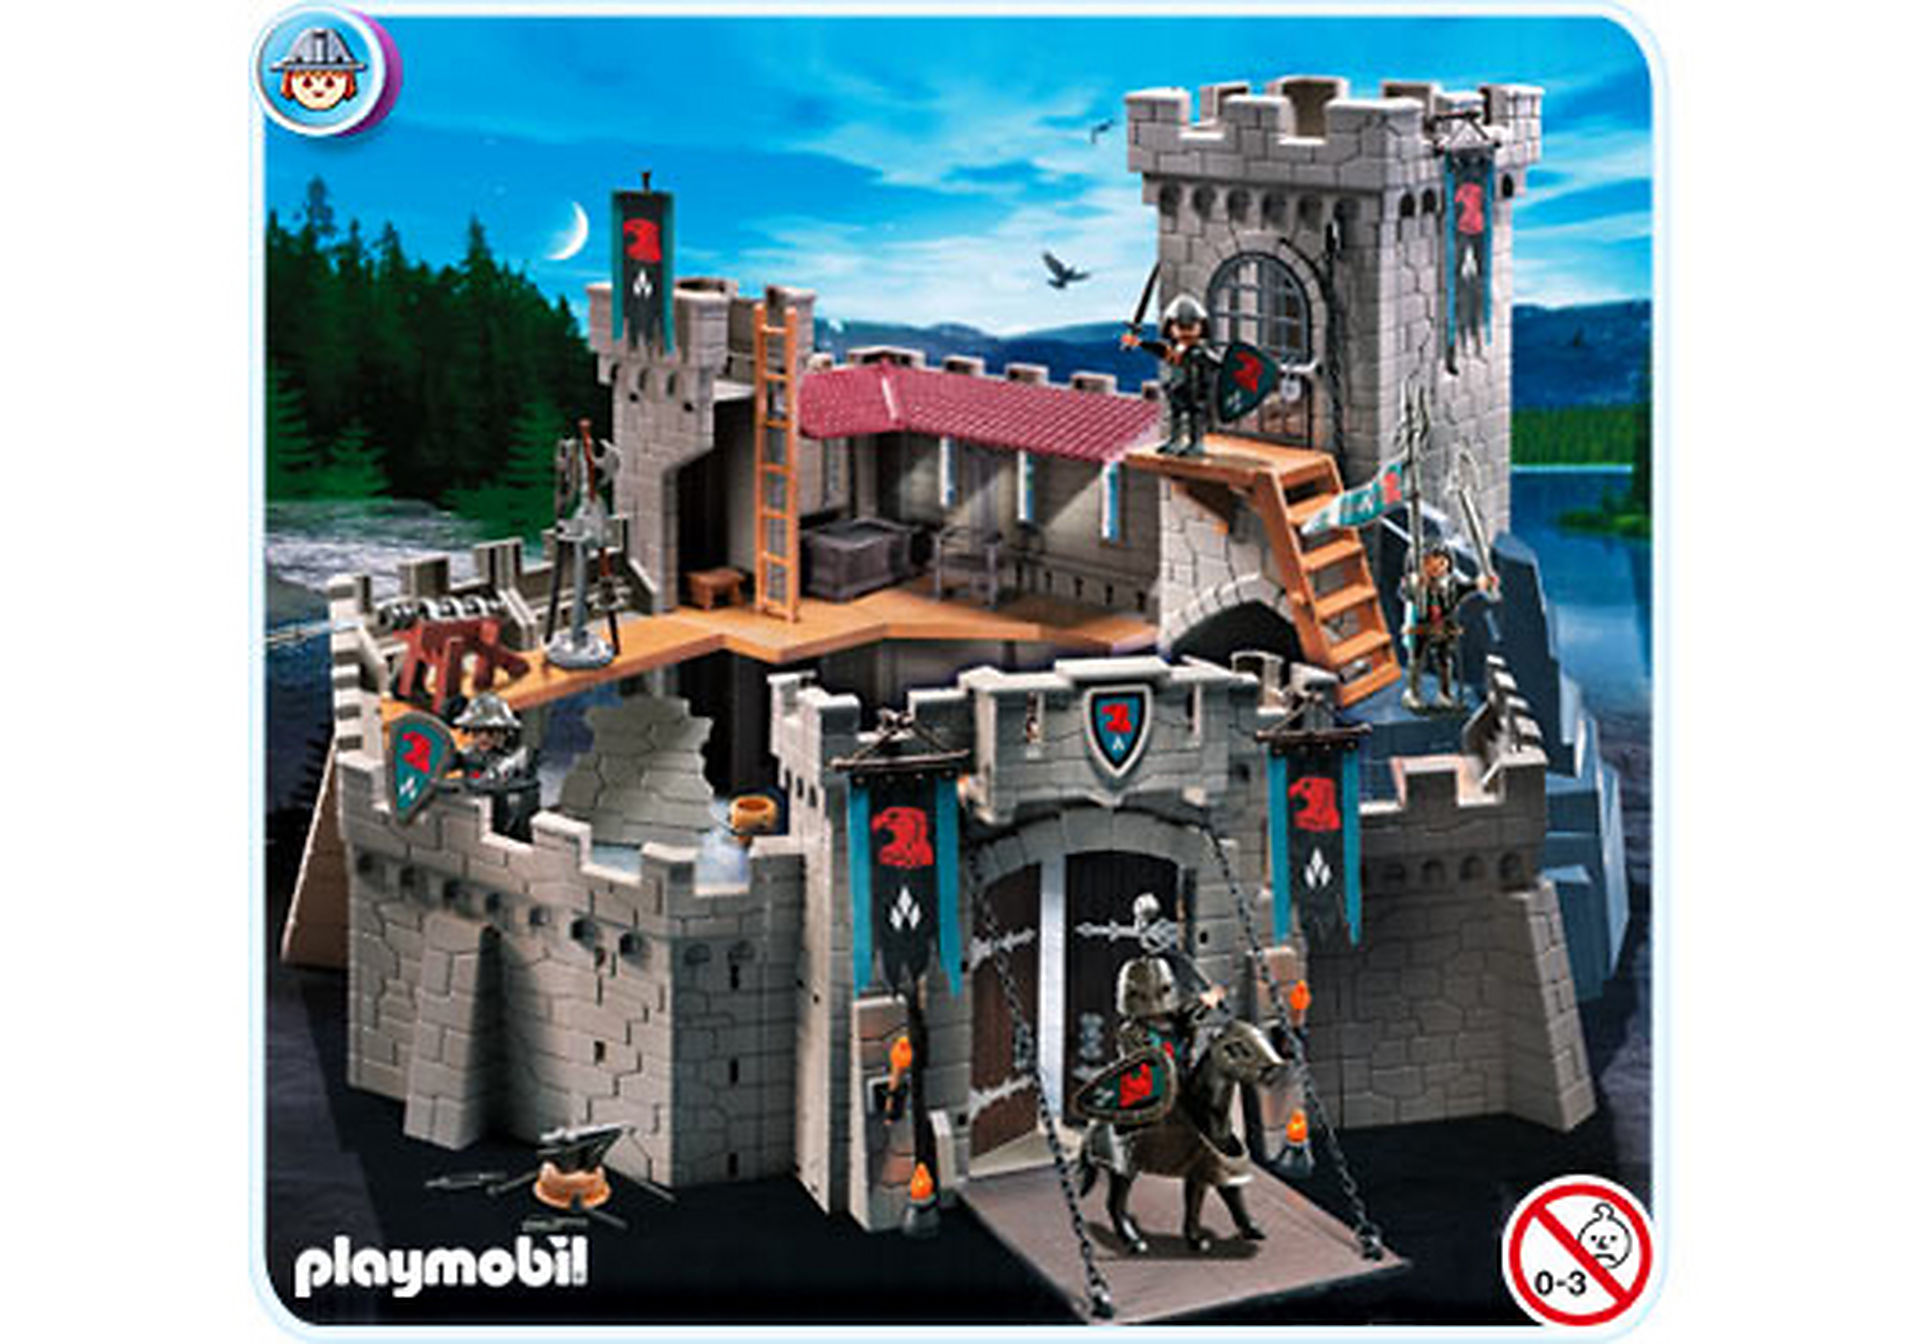 http://media.playmobil.com/i/playmobil/4866-A_product_detail/Raubritterburg